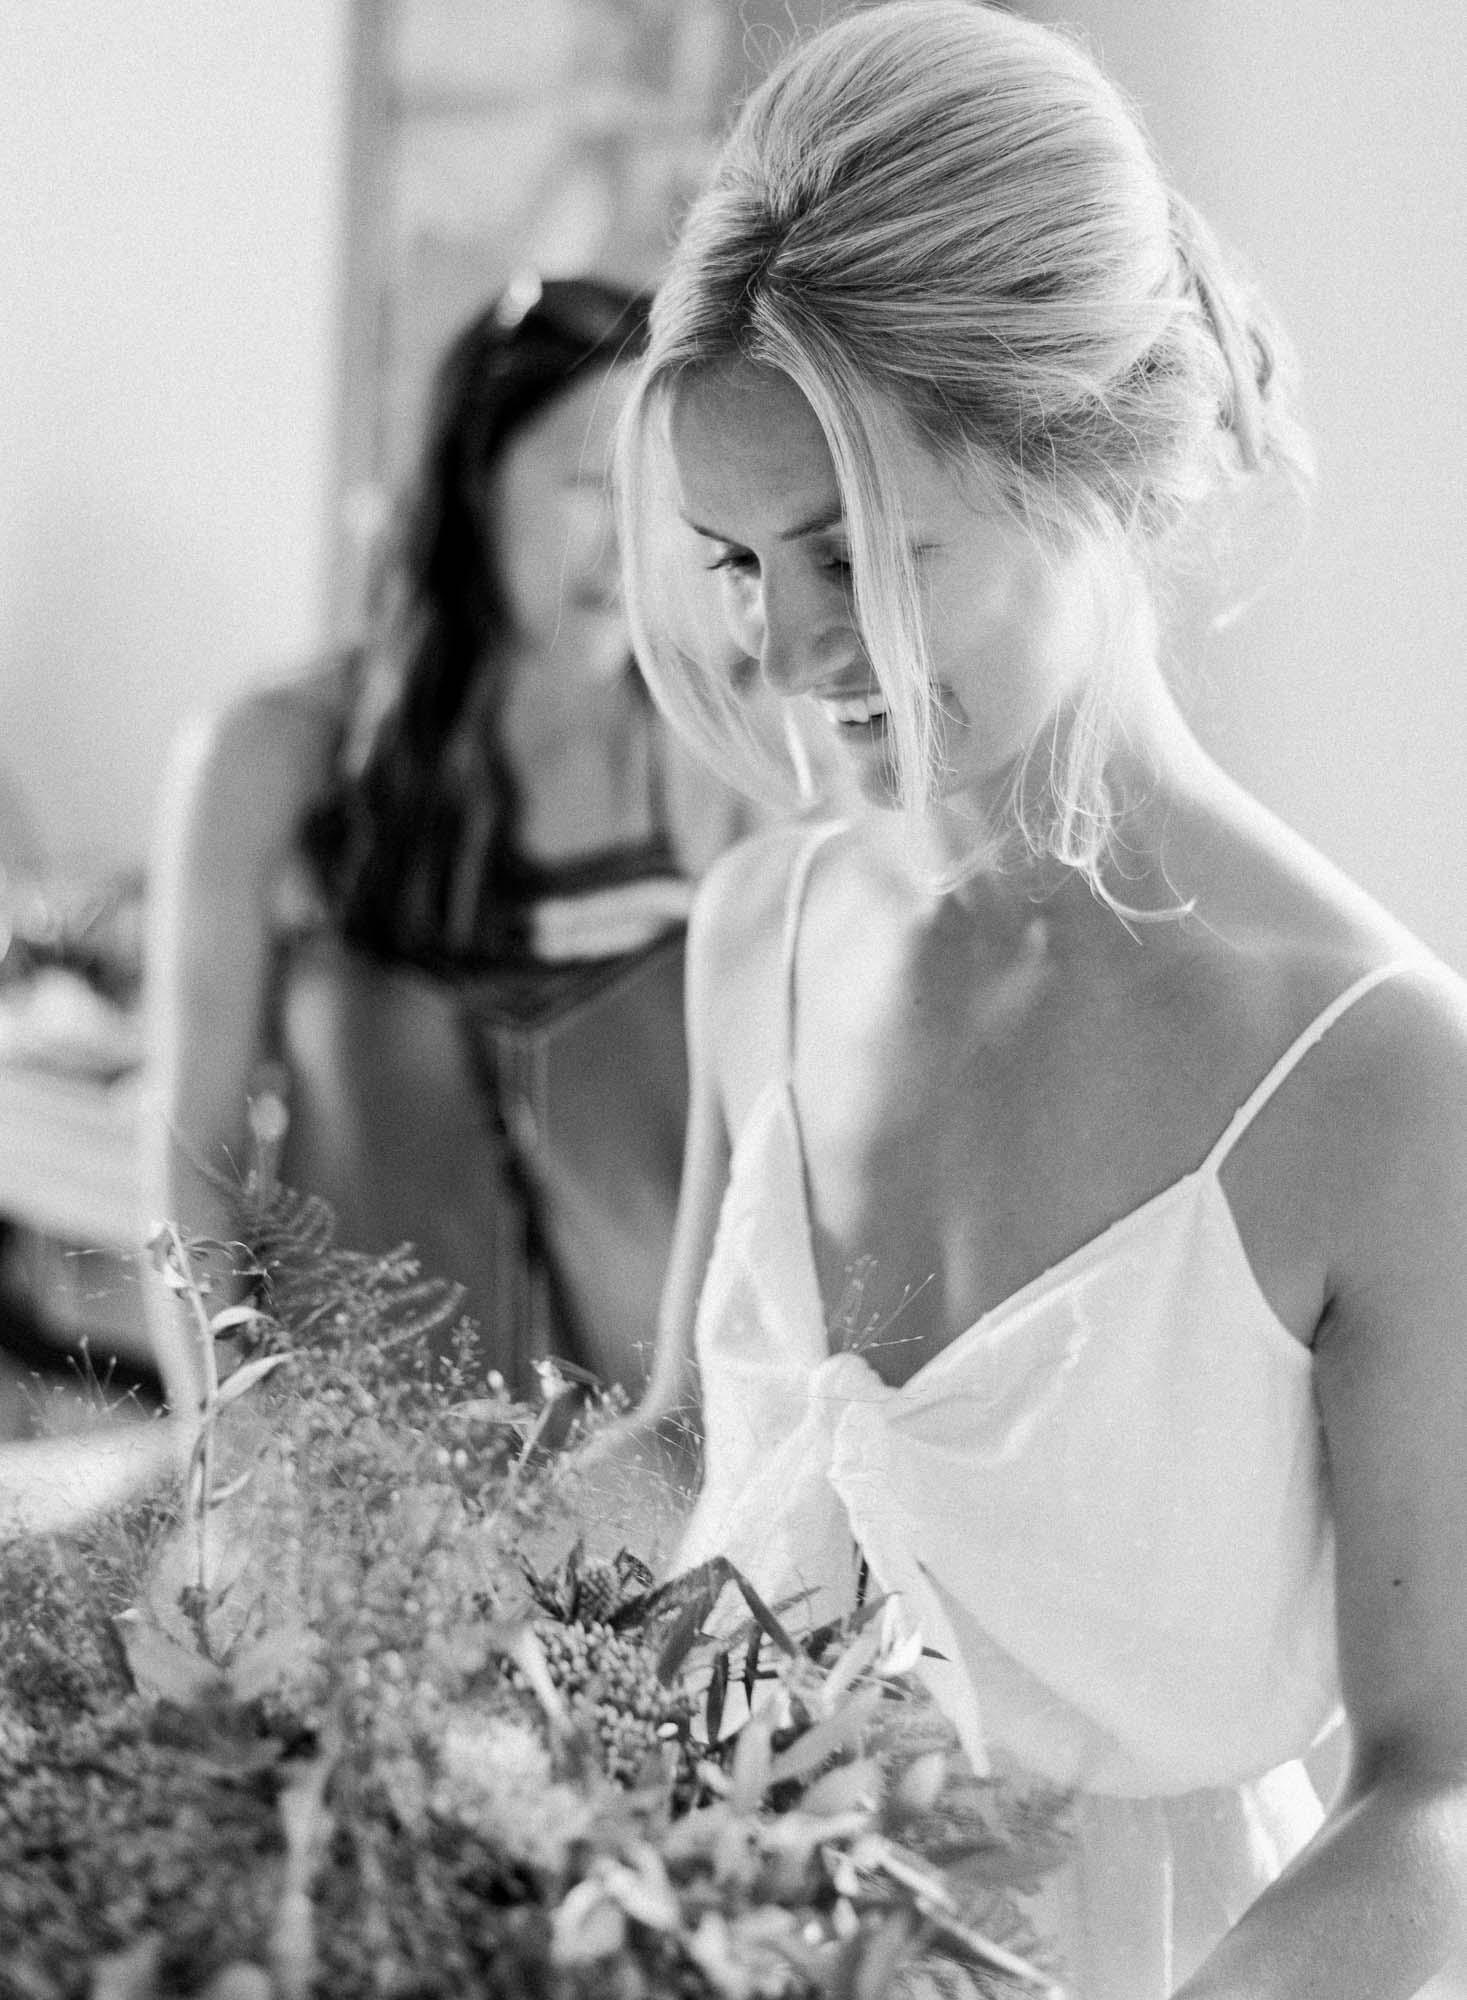 gascony_french_wedding-13.jpg